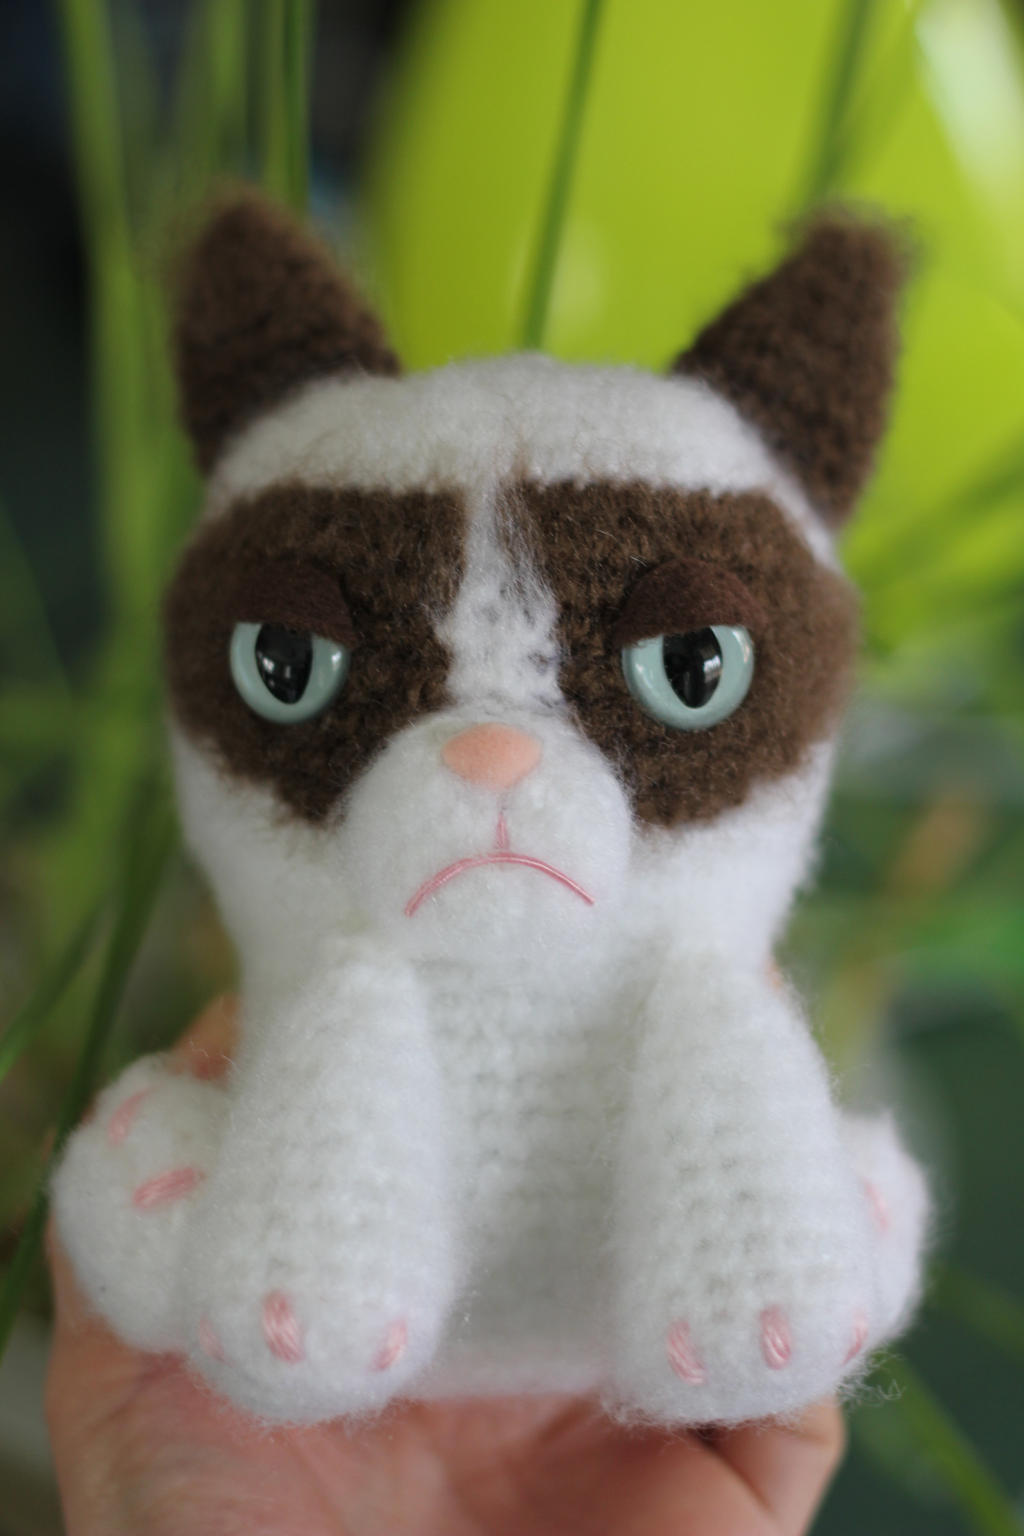 Tardar Sauce the Grumpy Cat Amigurumi Doll by Npantz22 on ... Tardar Sauce